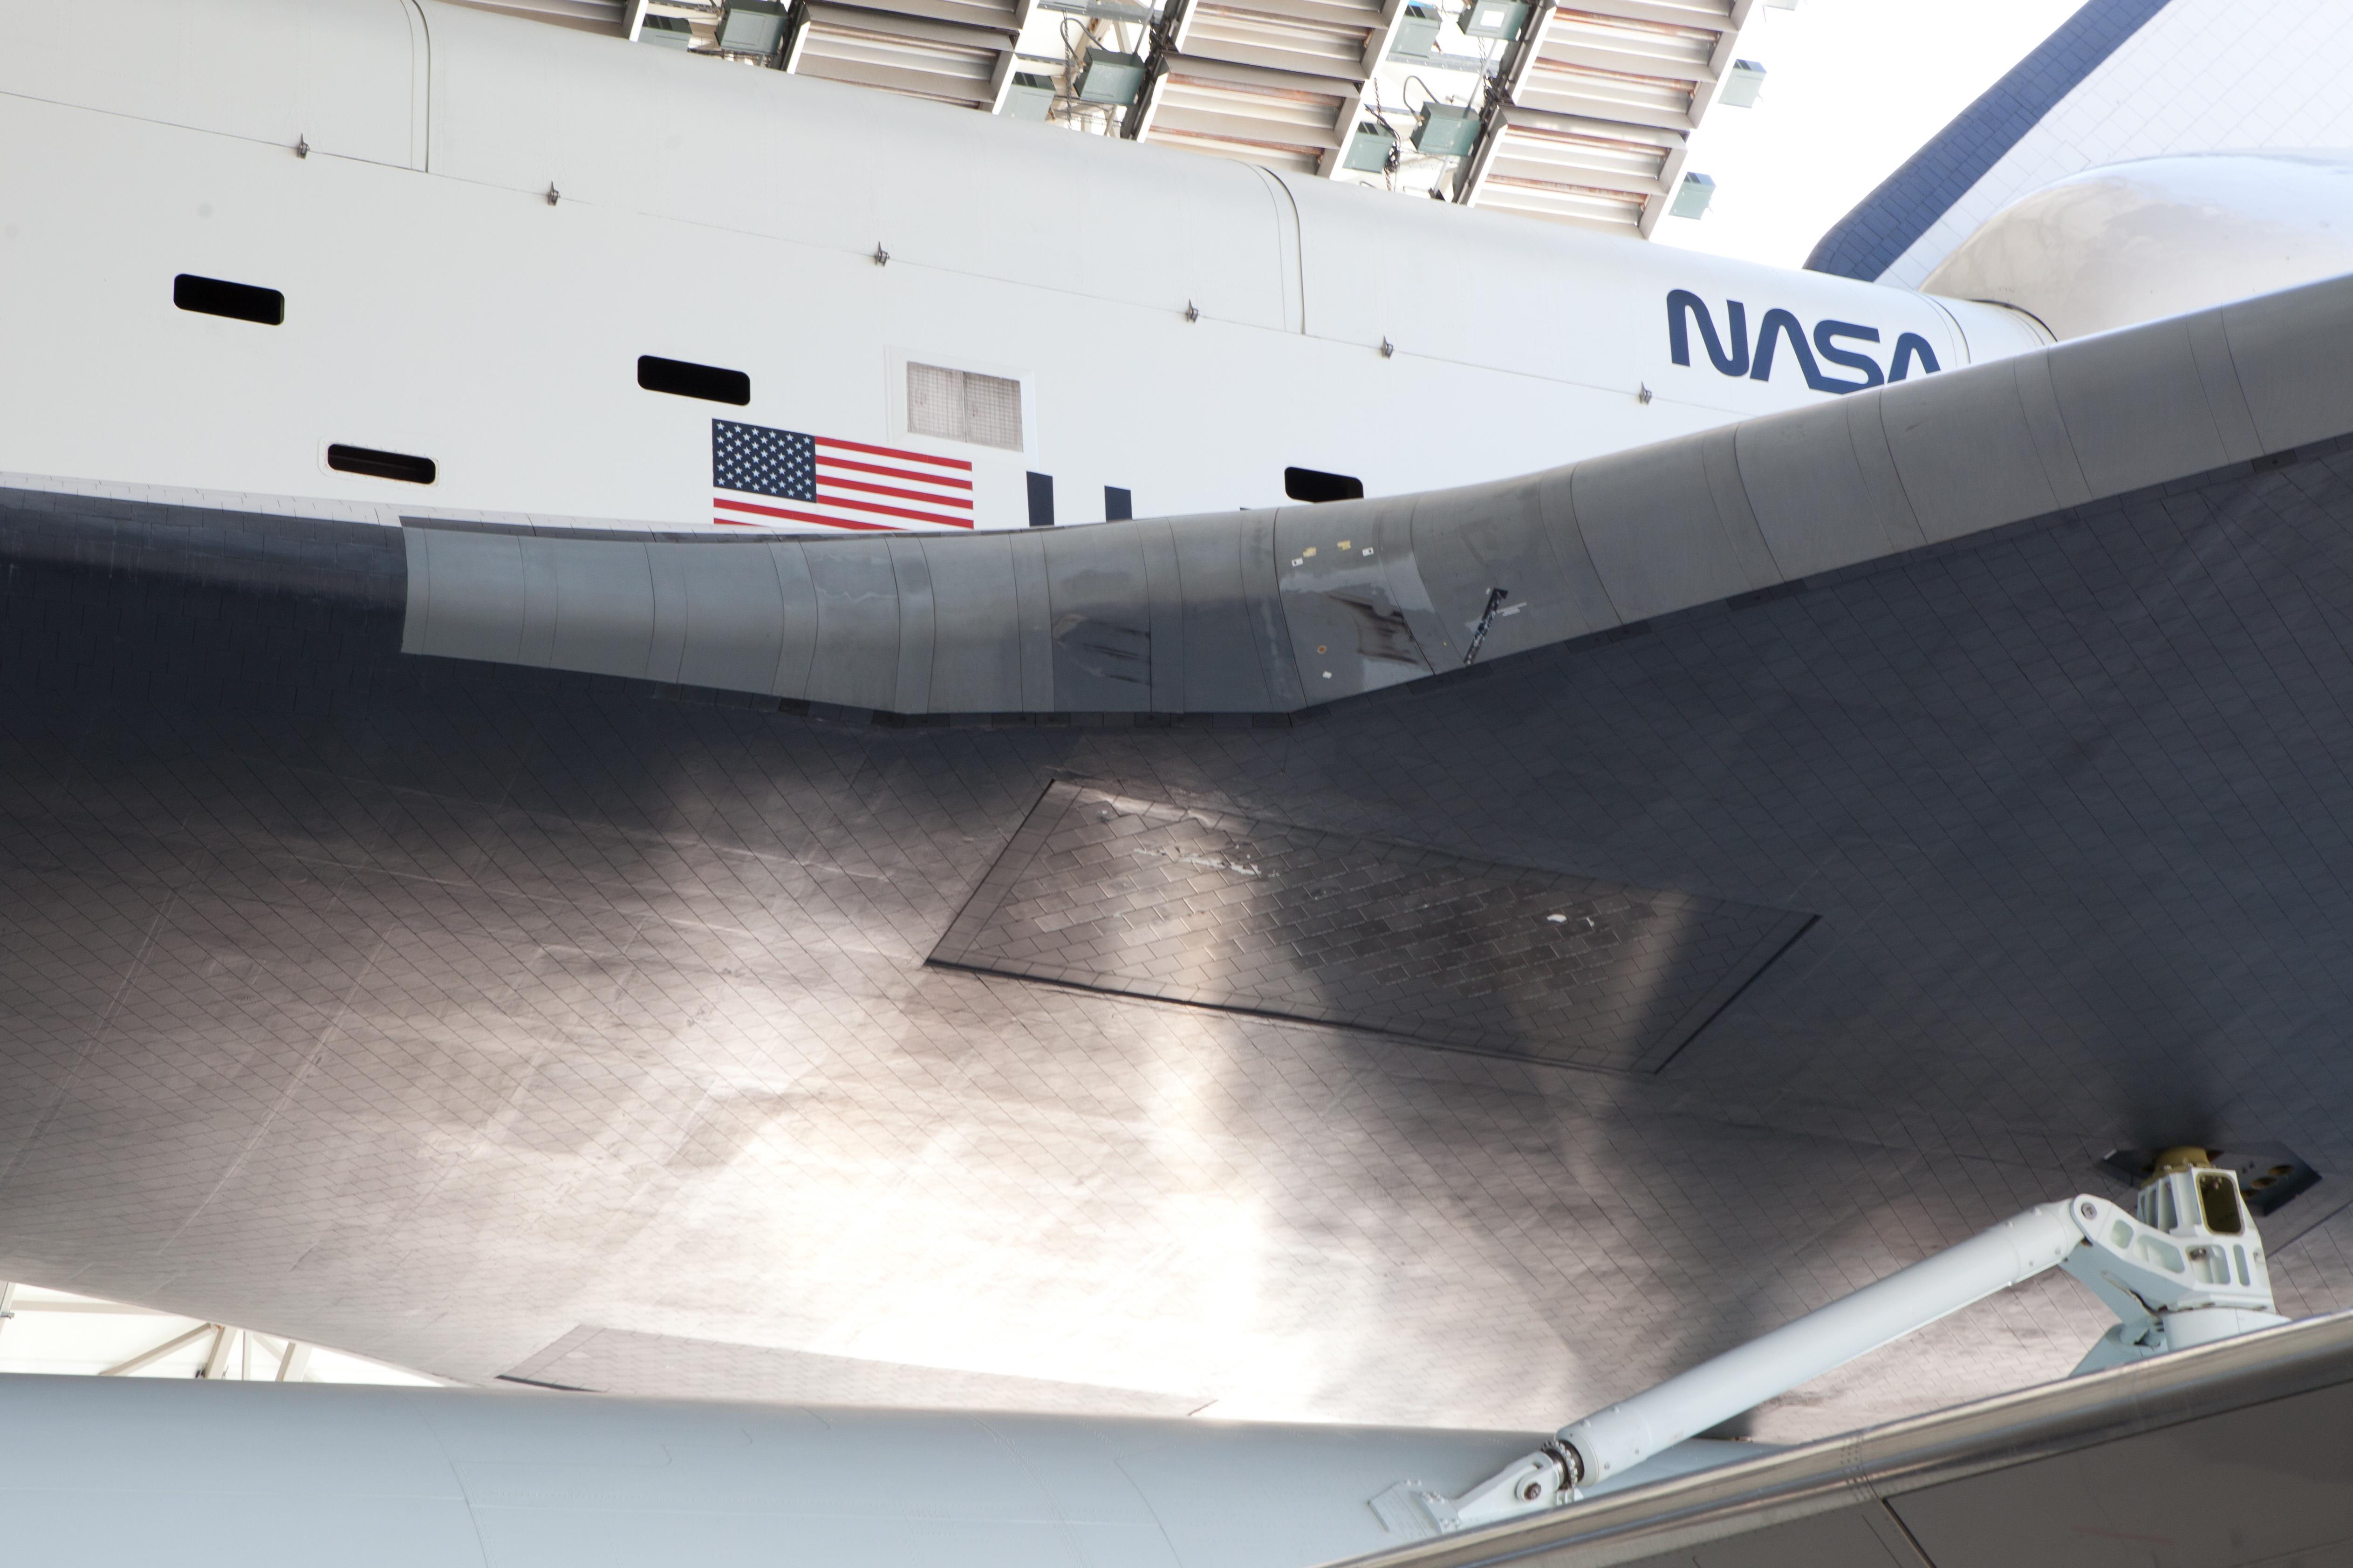 Enterprise_wing_panel.jpg